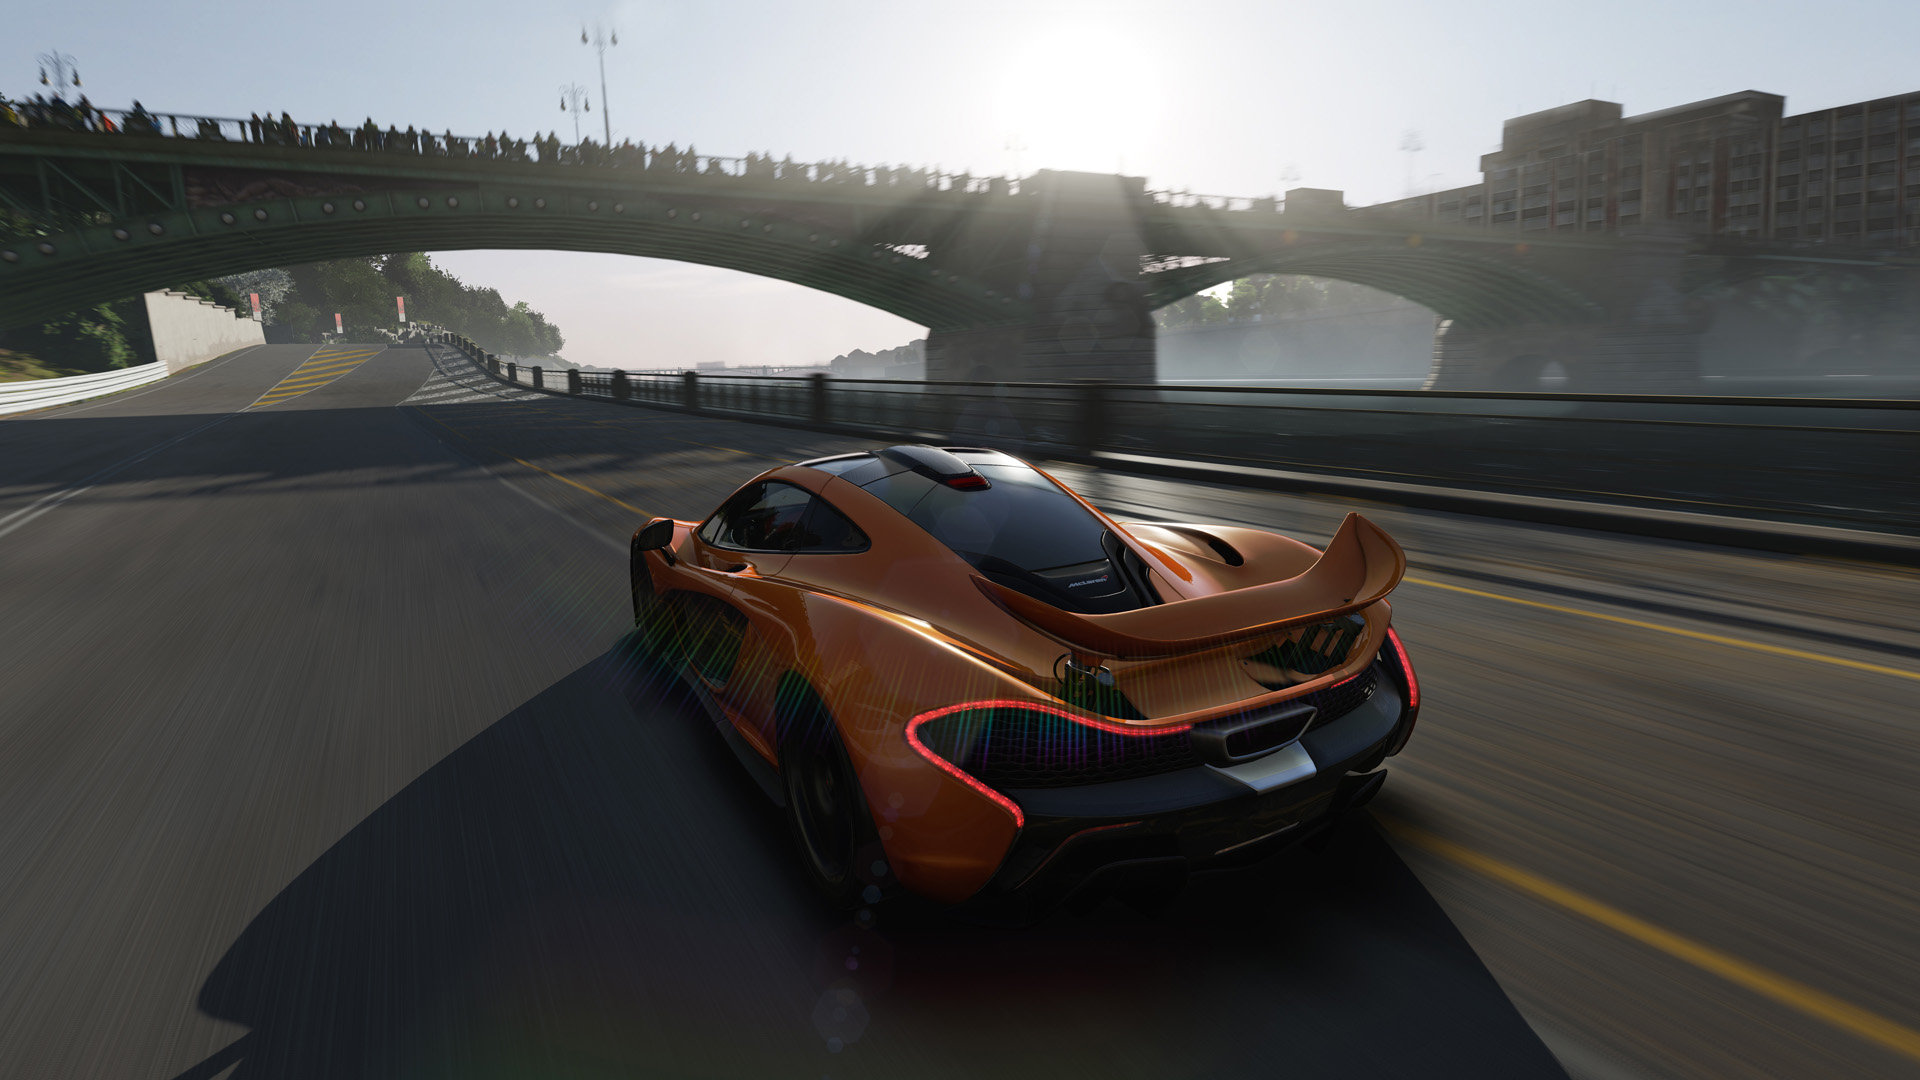 Forza Motorsport 5 Exclusive HD Wallpapers 5094 1920x1080